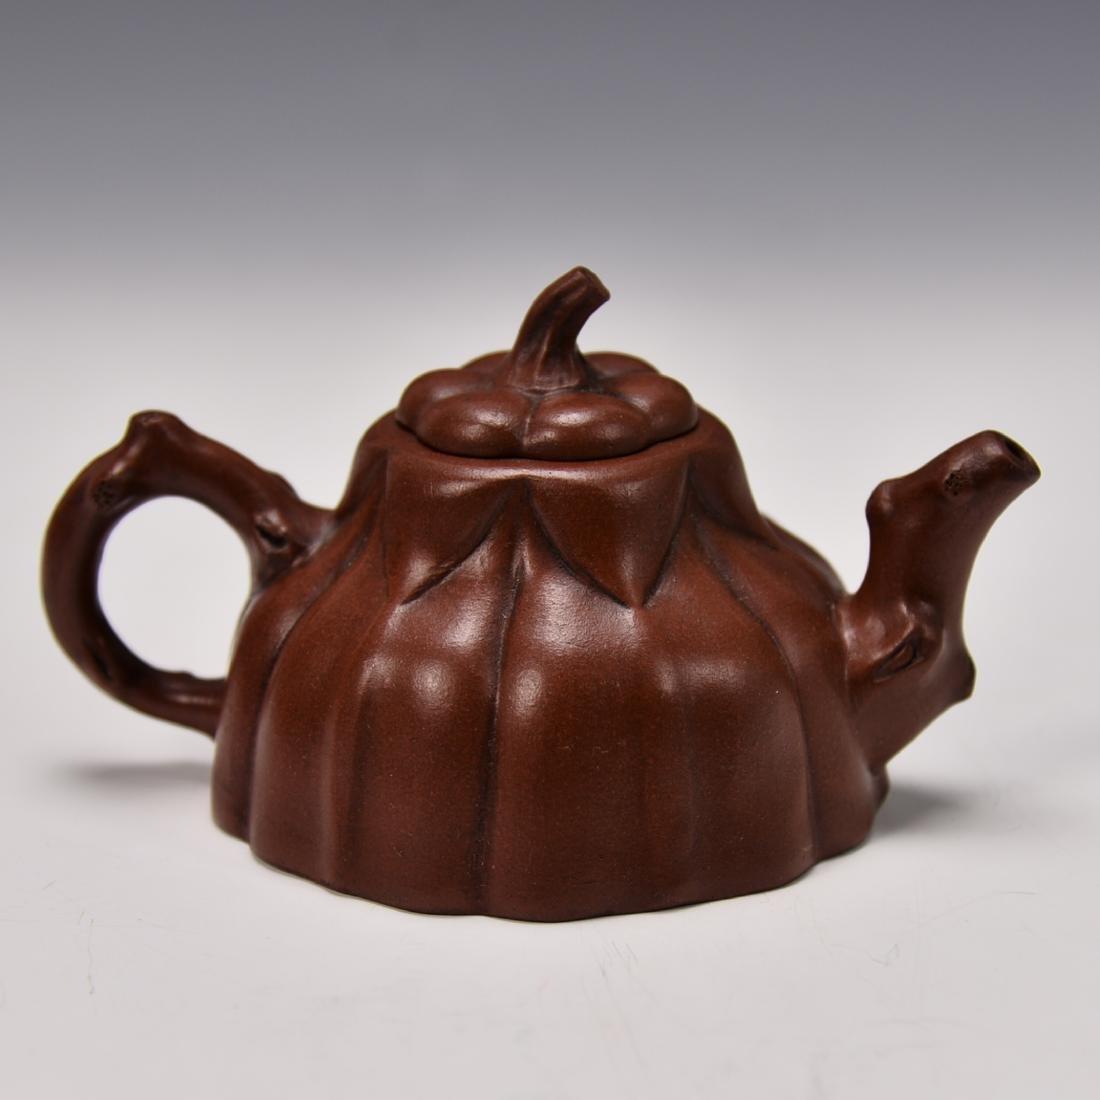 CHINESE YIXING ZISHA TEA POT - 6